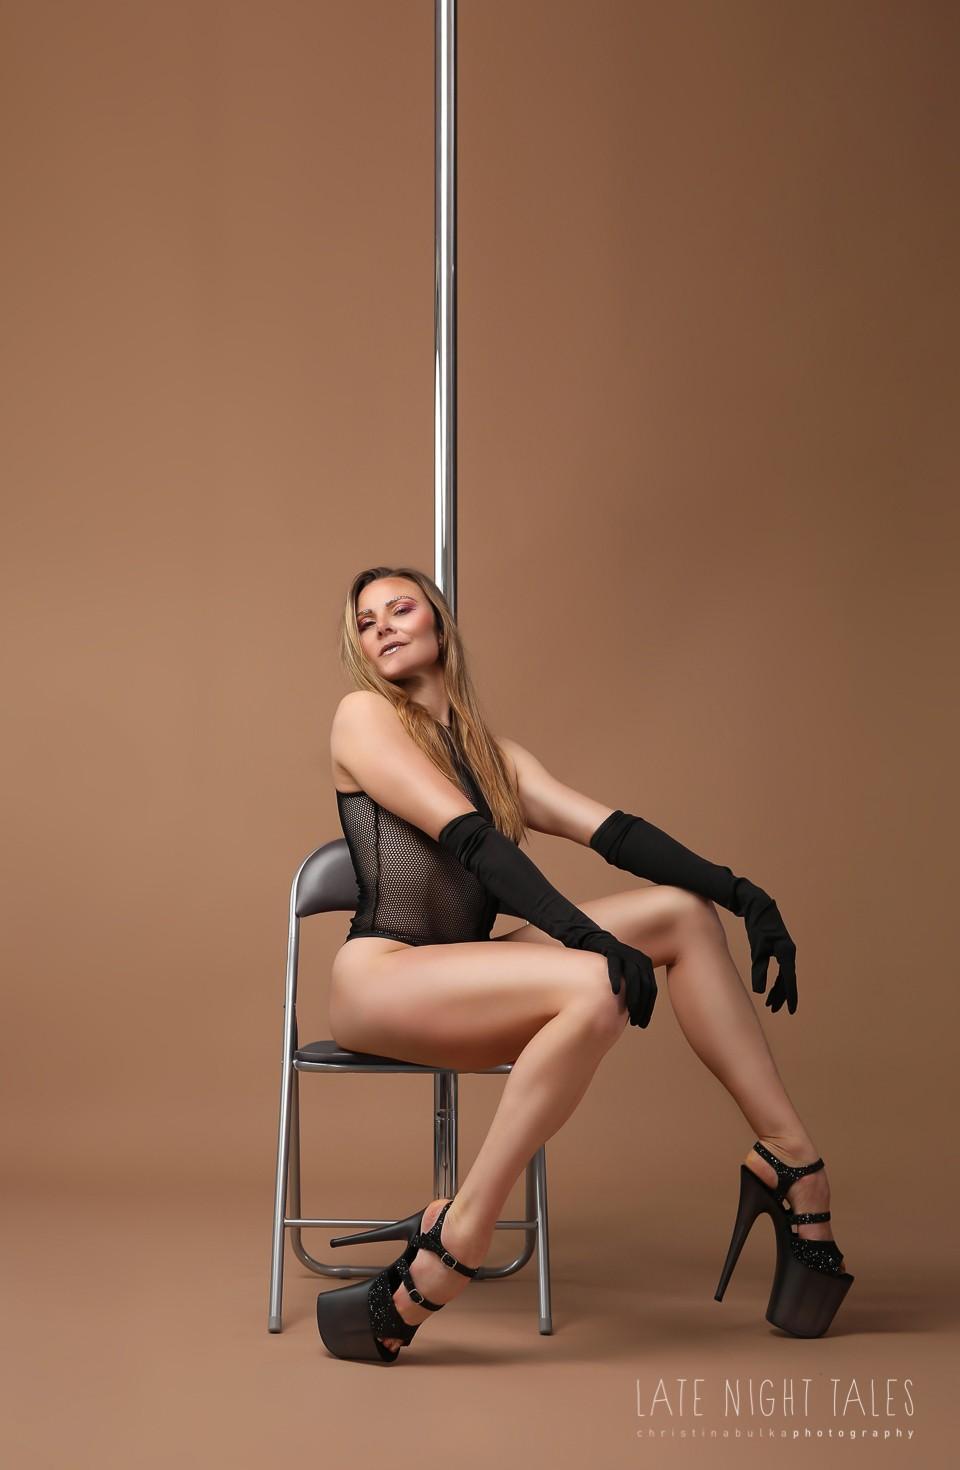 CarolaStutz_Pole-Pole Academy-final_APR2021-P3-web-3-11